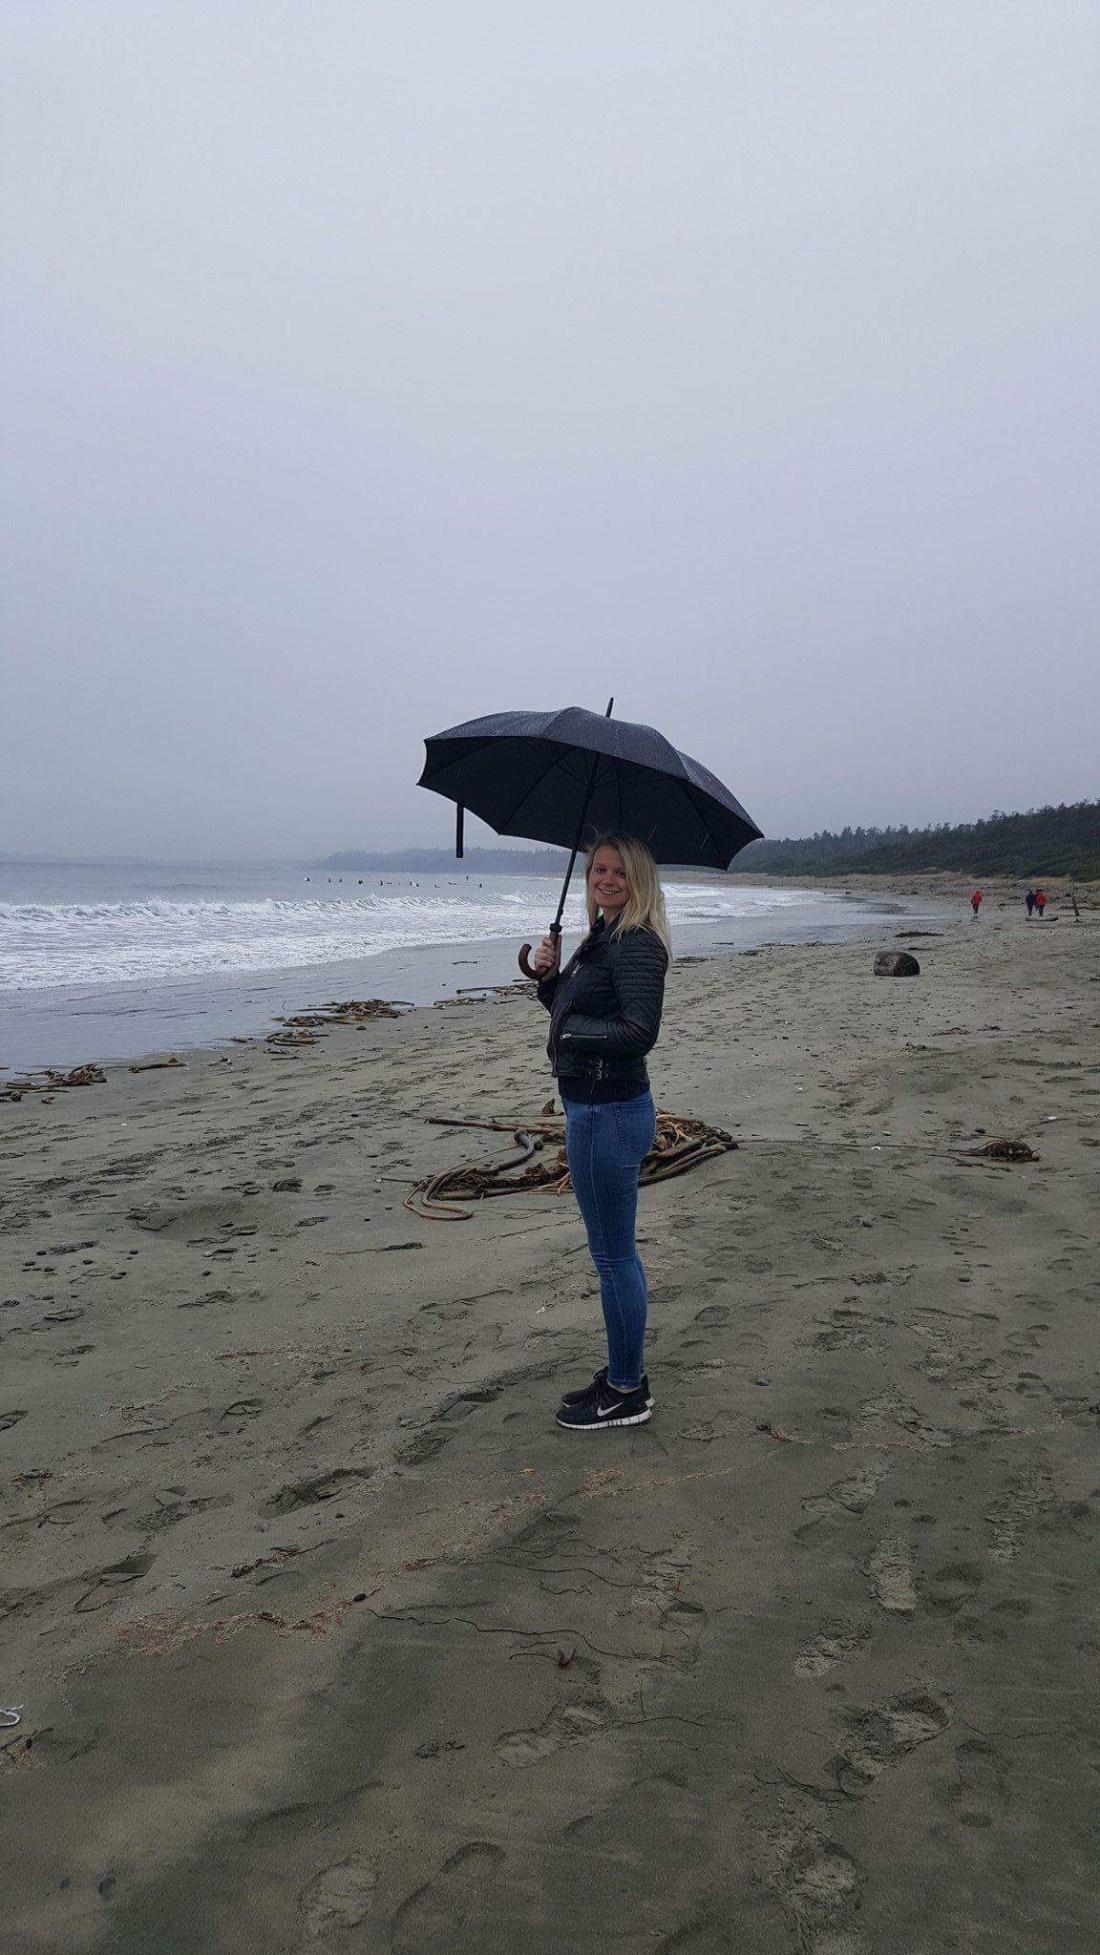 Laura with an umbrella on Long Beach, Ucluelet